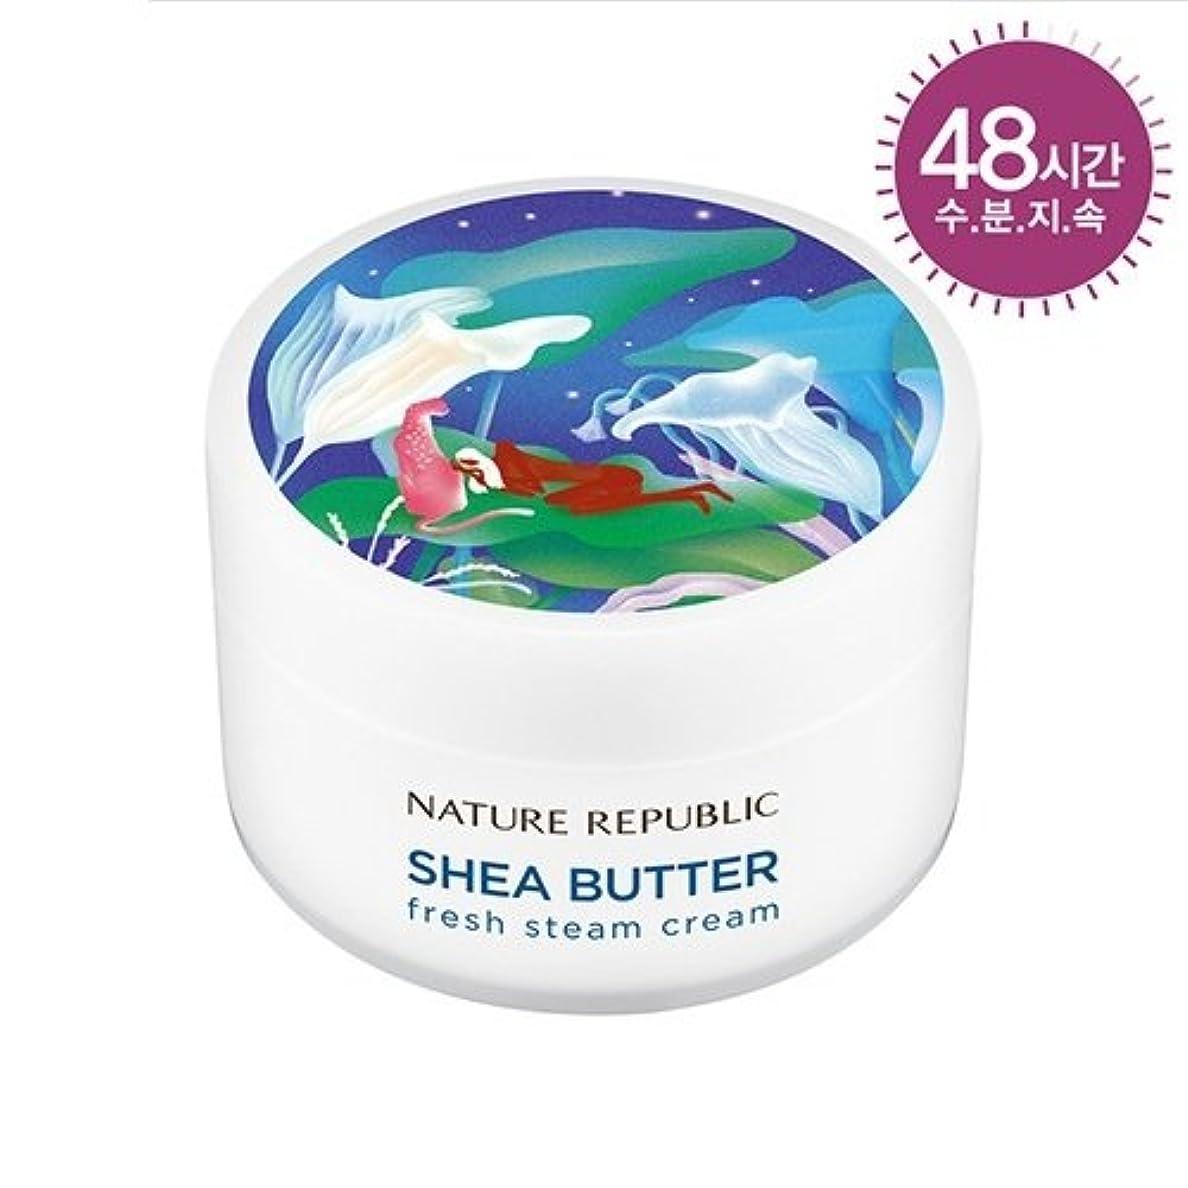 NATURE REPUBLIC(ネイチャーリパブリック) SHEA BUTTER STEAM CREAM シアバター スチーム クリーム #フレッシュスオイリー肌